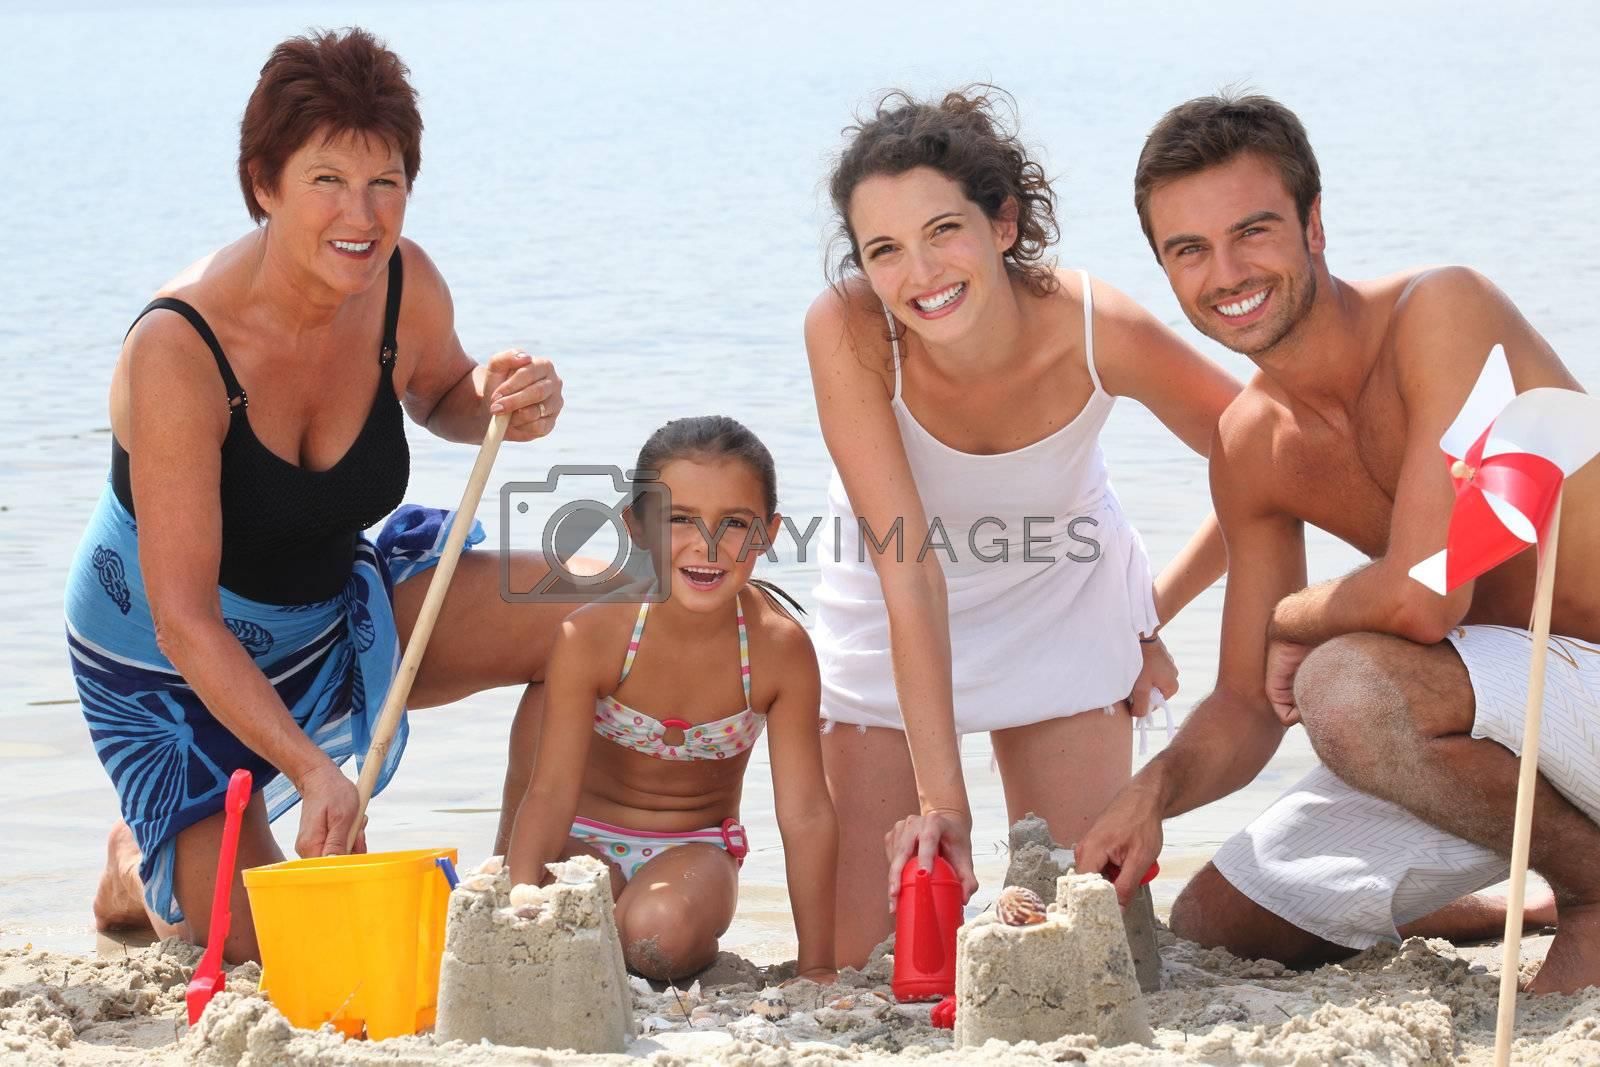 Family building sandcastles on the beach